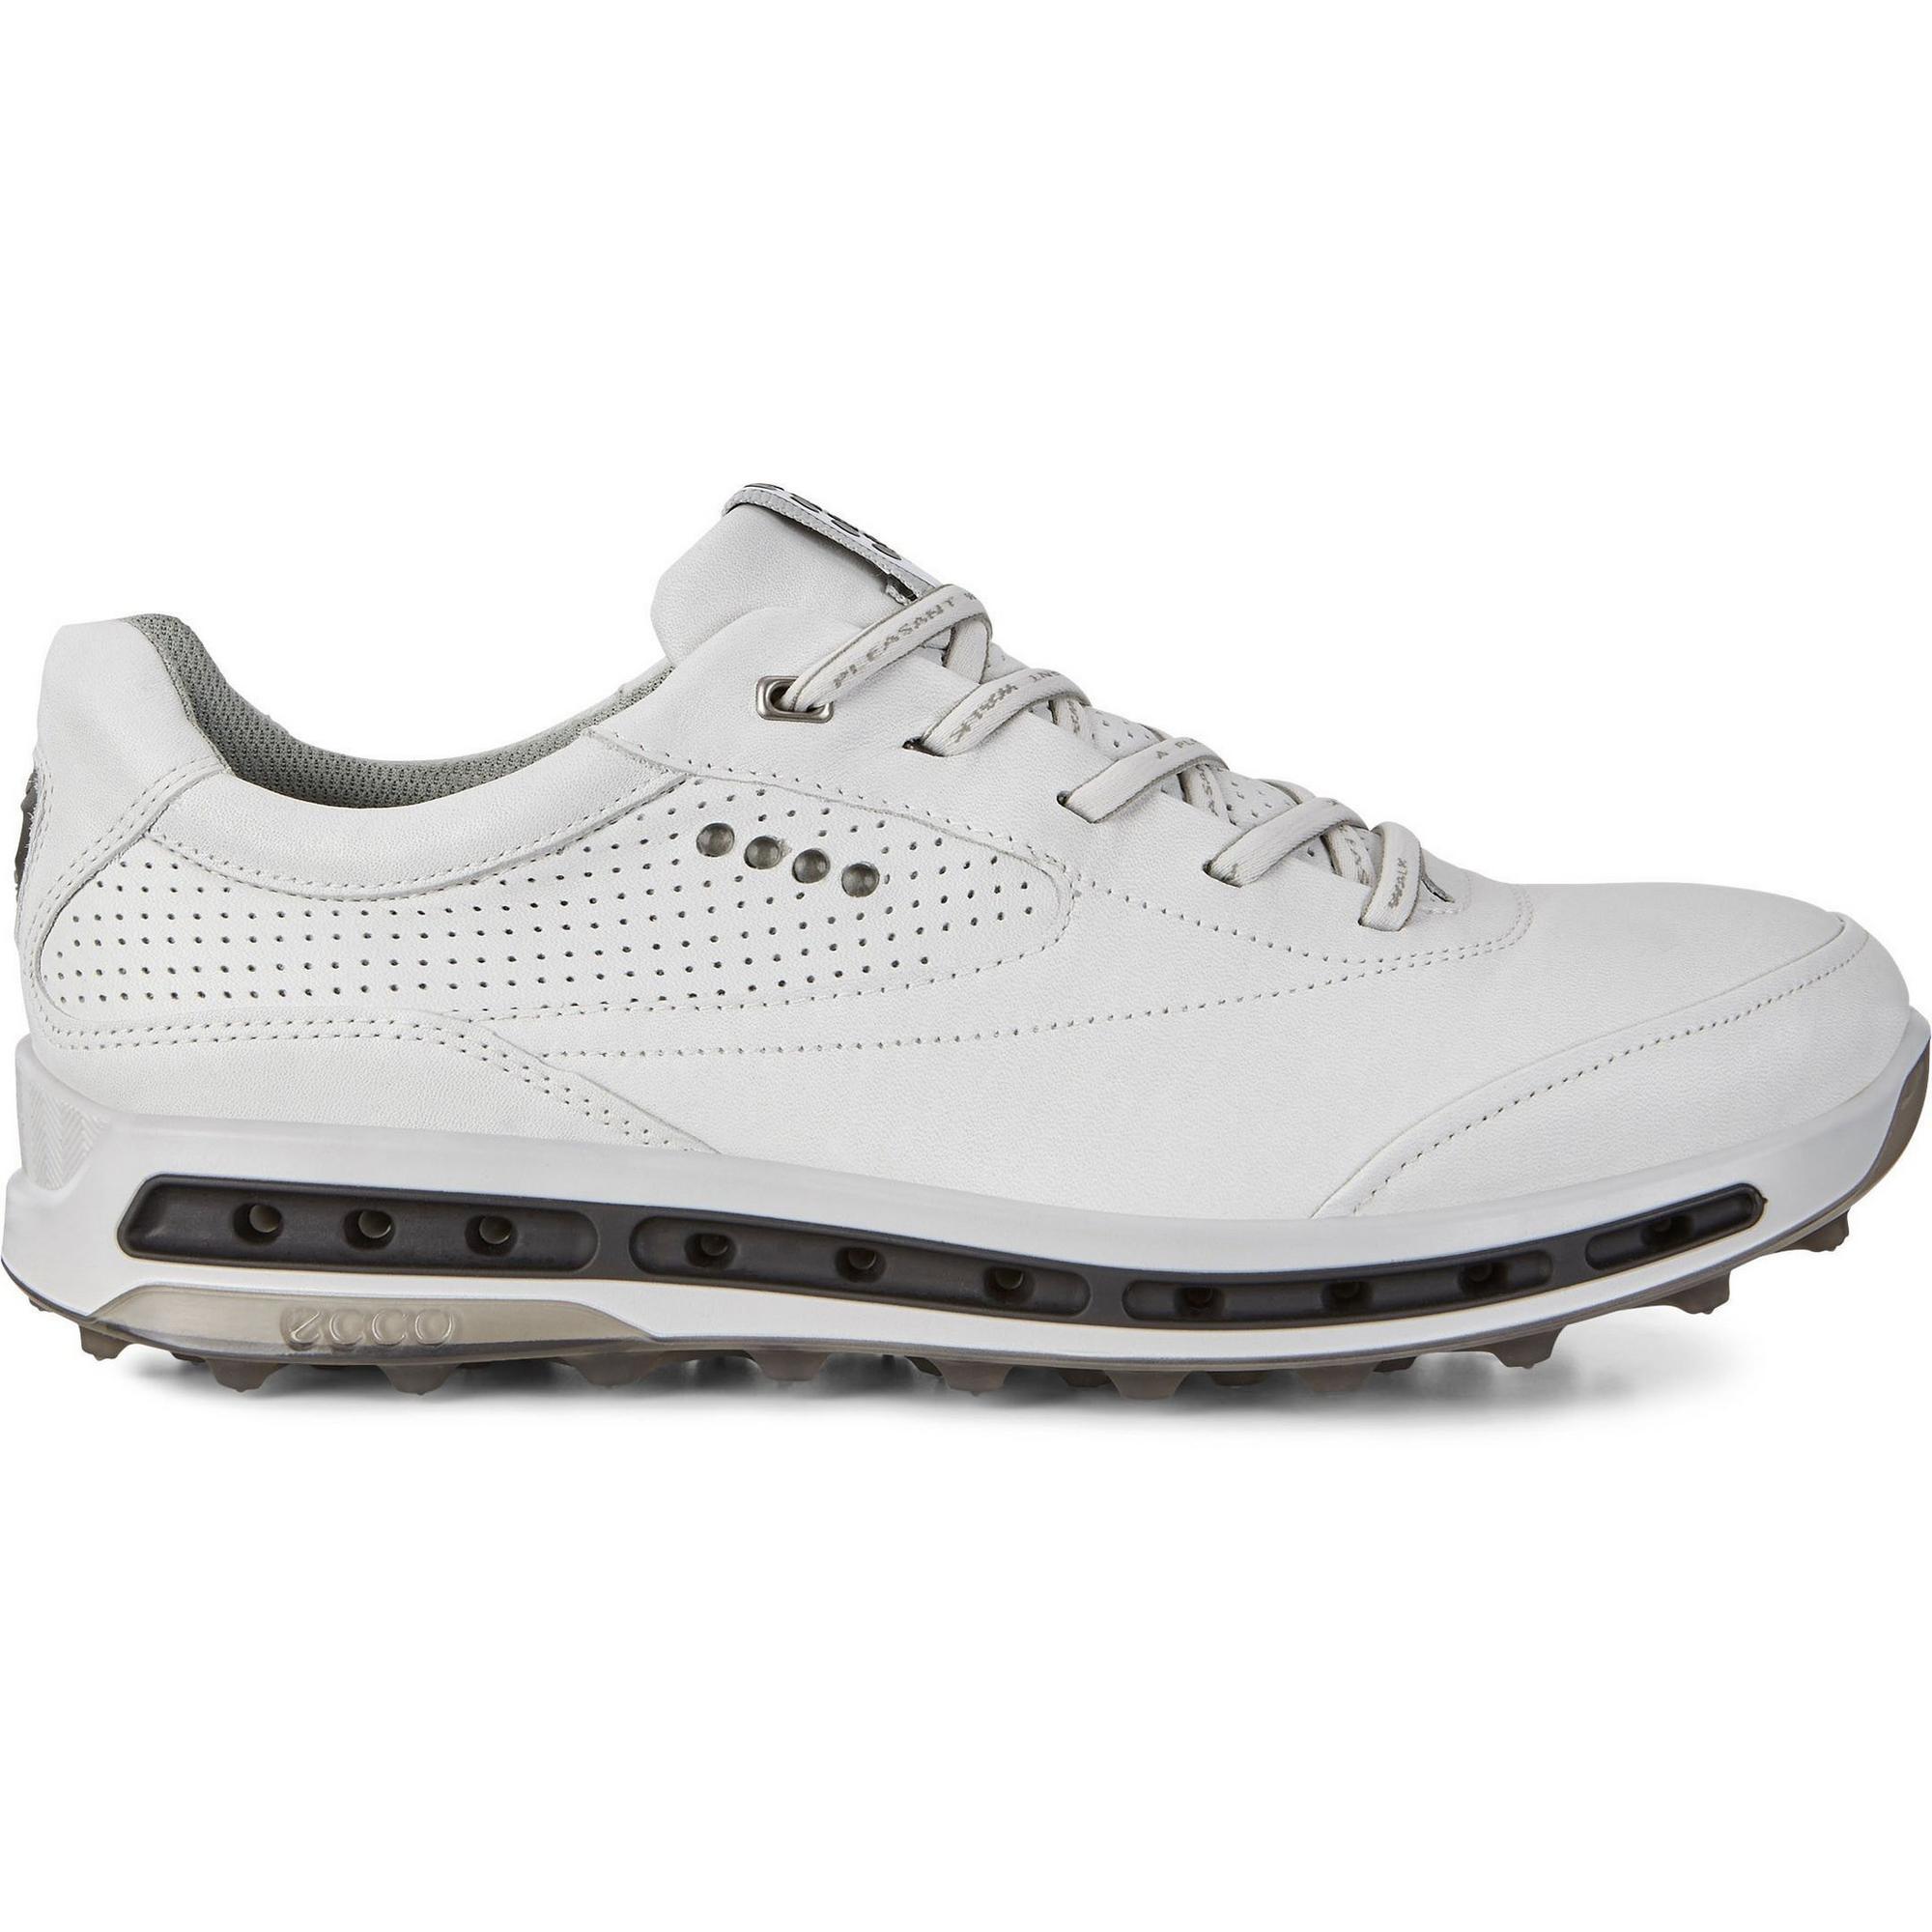 Men's Goretex Cool Pro Spikeless Golf Shoe - White/Black